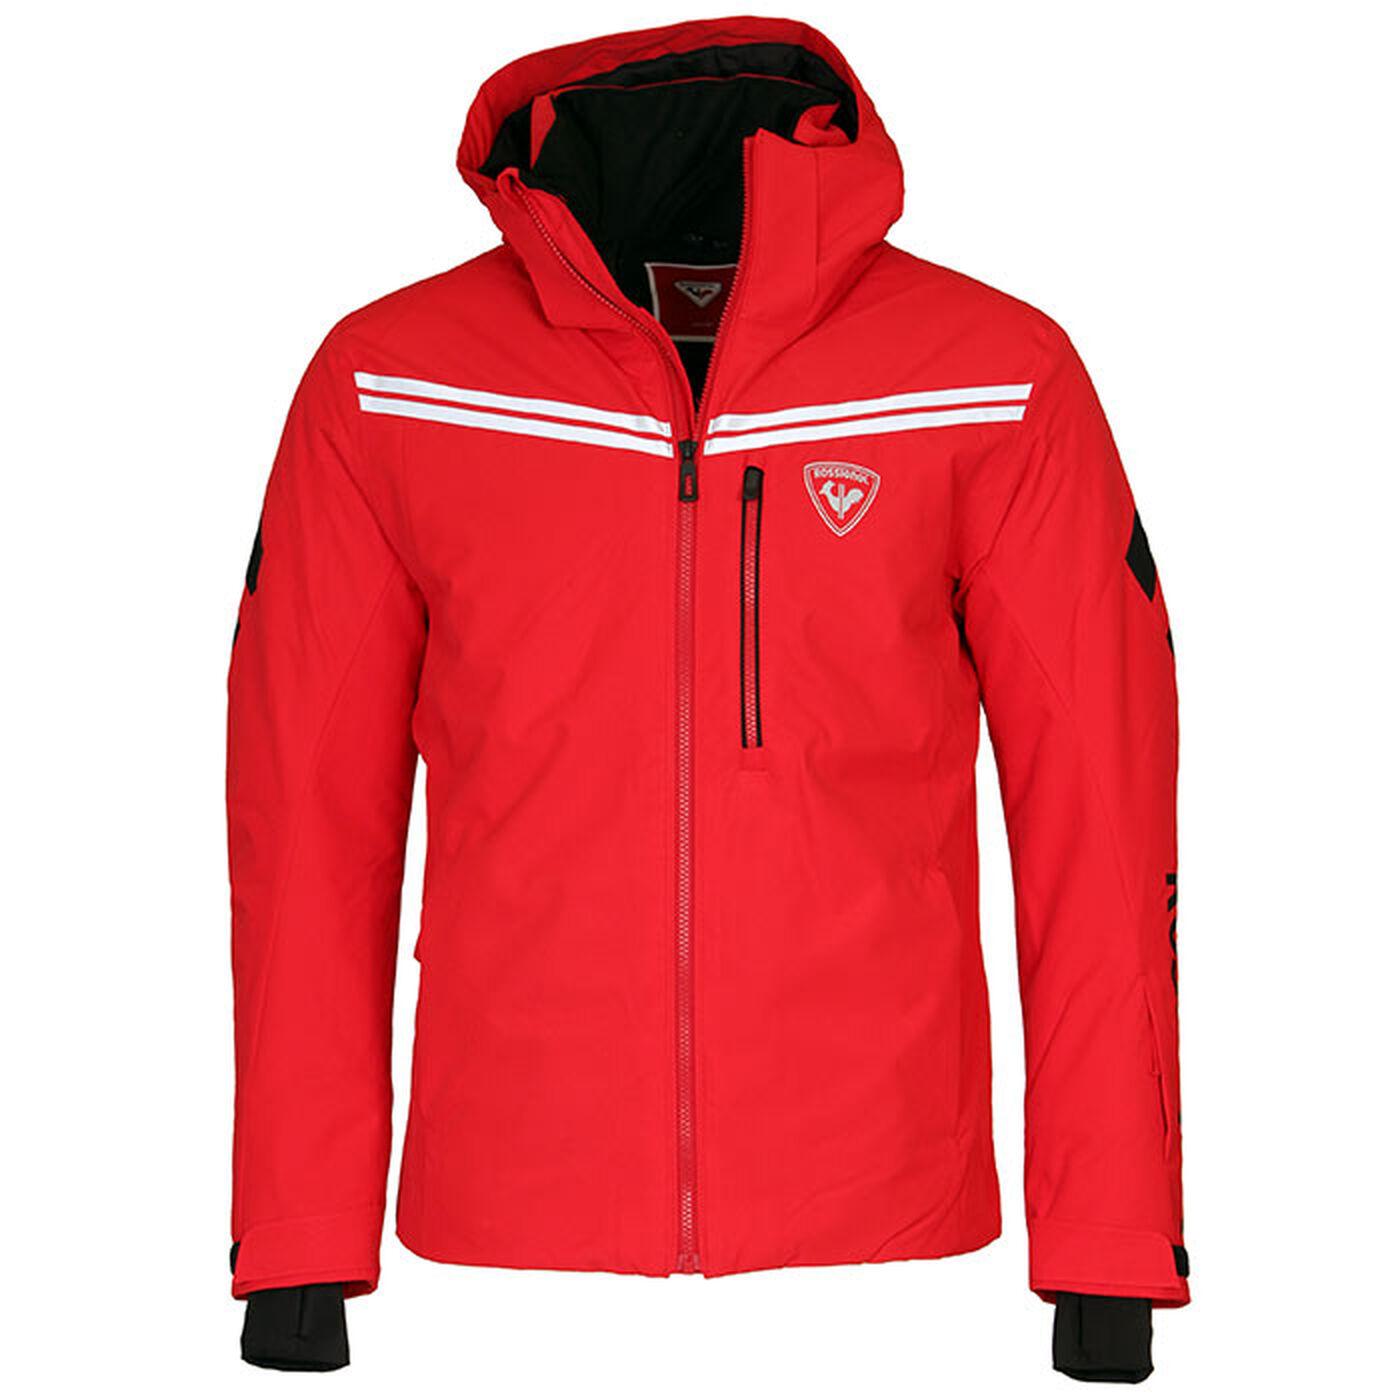 Rossignol jacket.